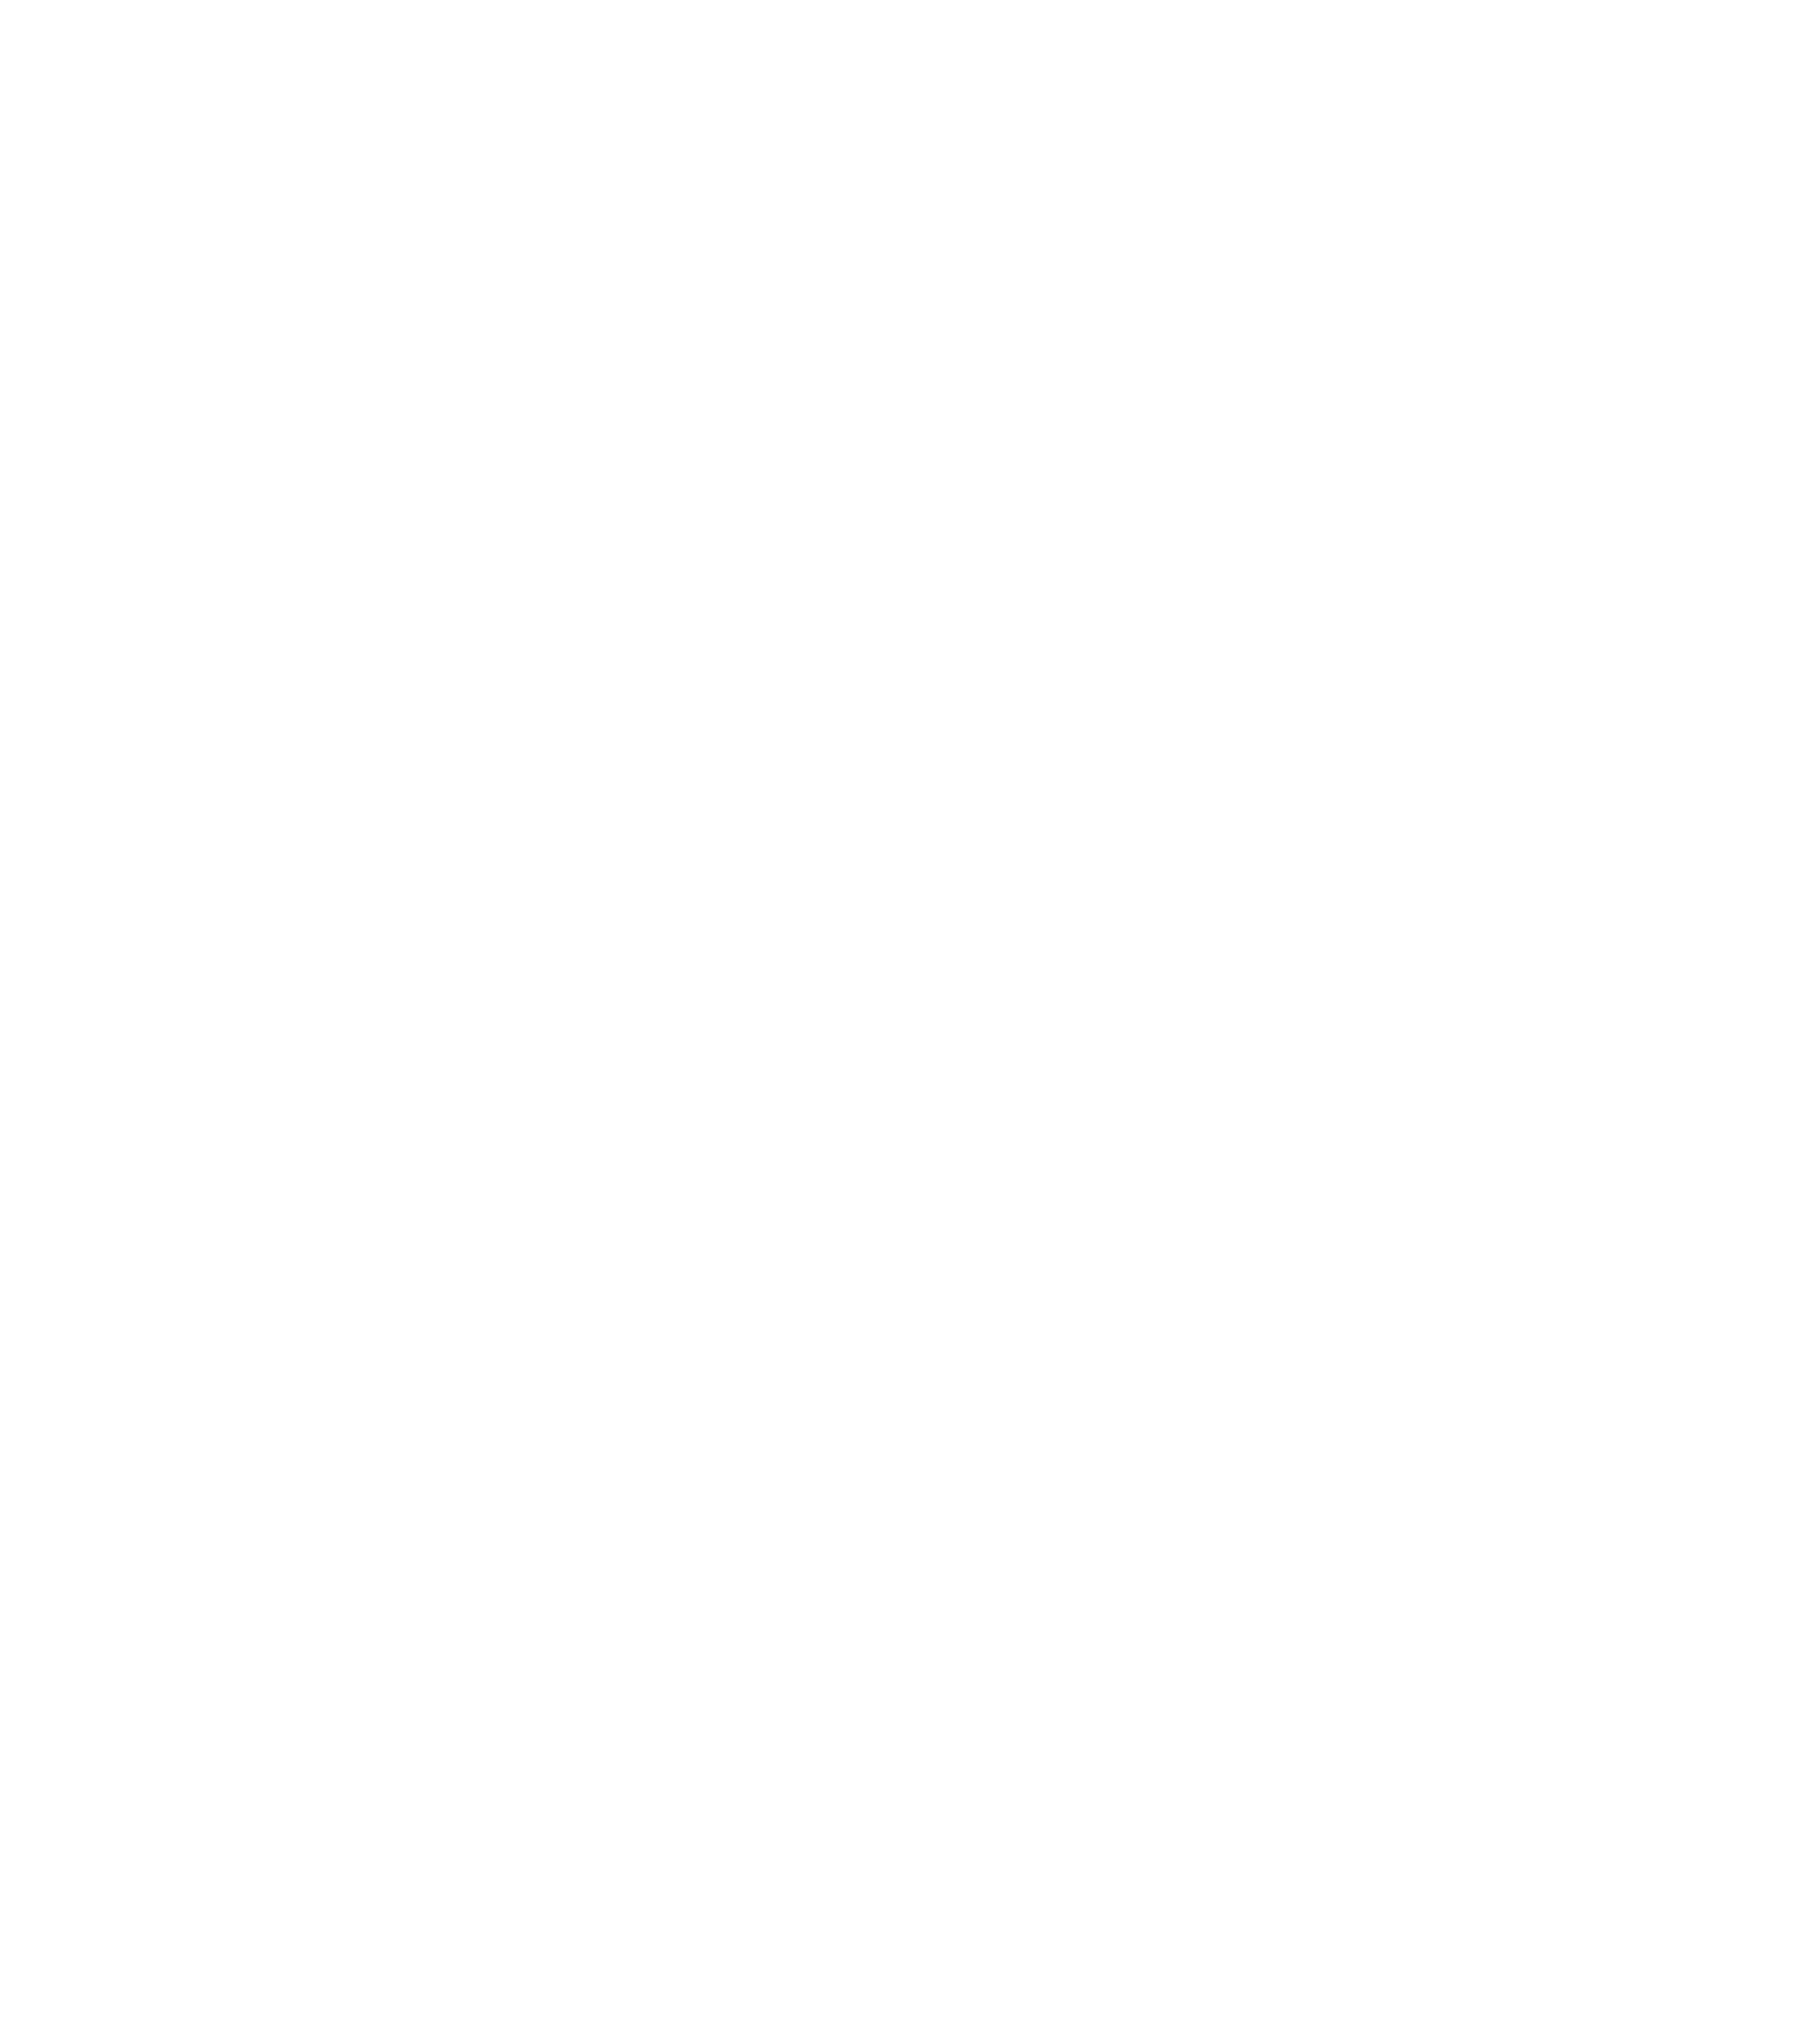 tcr-main-image_alt2